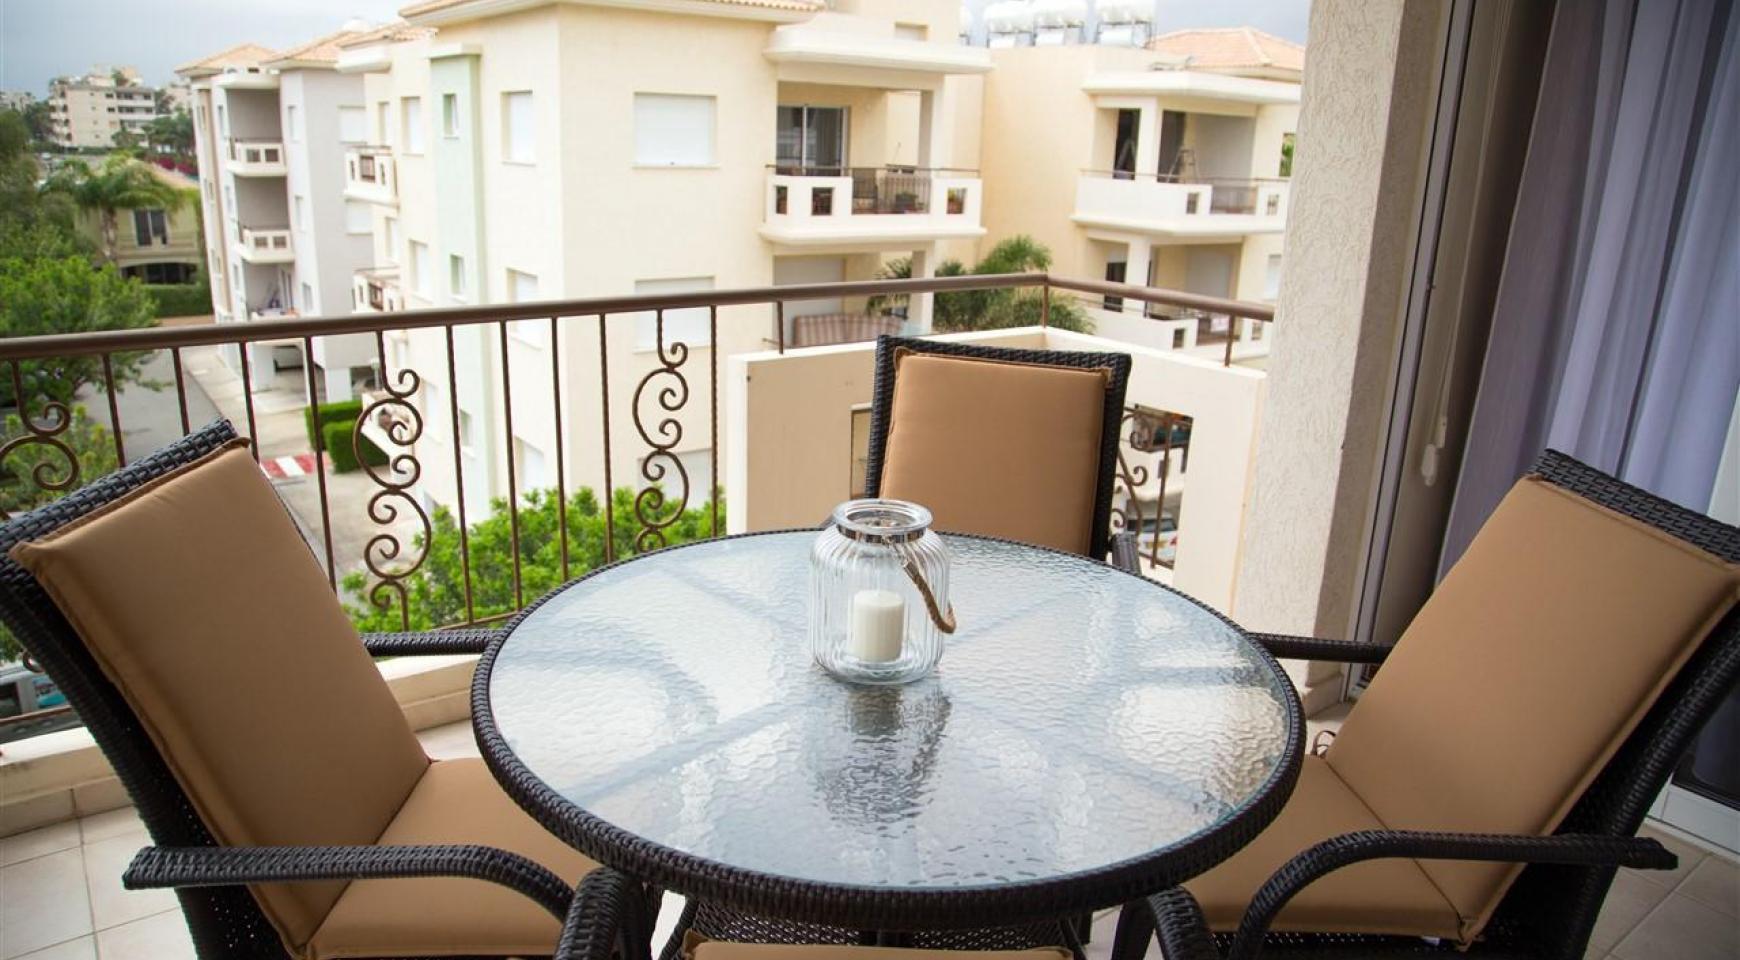 Luxury 2 Bedroom Apartment Mesogios Iris 304 in the Tourist area near the Beach - 23